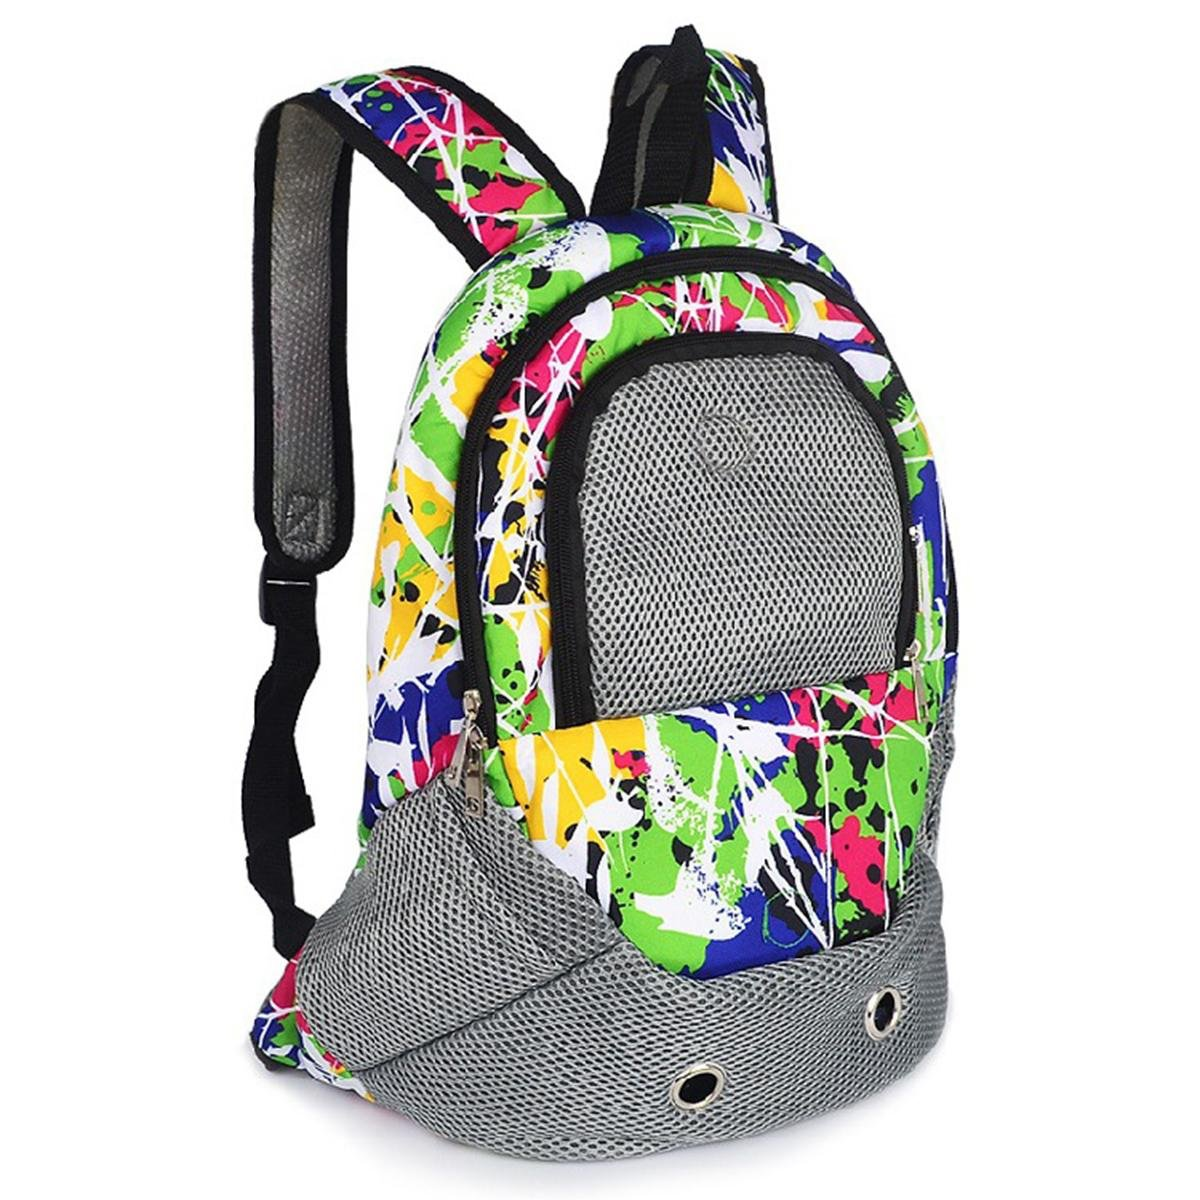 color SHKY Pet Dog Cat Puppy Carrier Backpack Bag Portable Airline Travel Approved Carrier Breathable Mesh Adjustable Front Bag Head Out Design Double Shoulder Padded